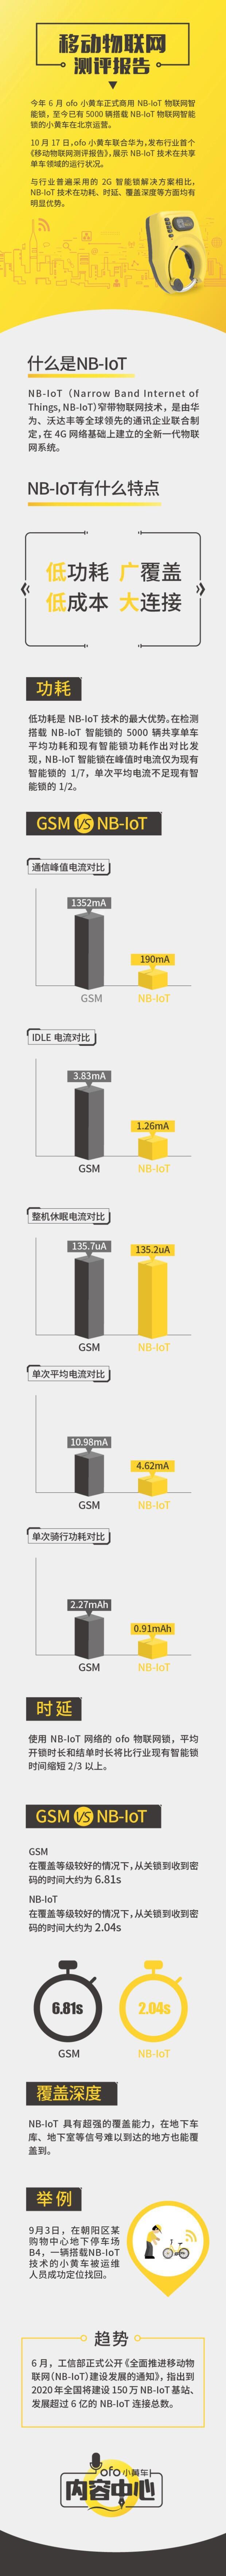 ofo发布首份移动物联网测评报告 NB-IoT是目前行业最佳解决方案